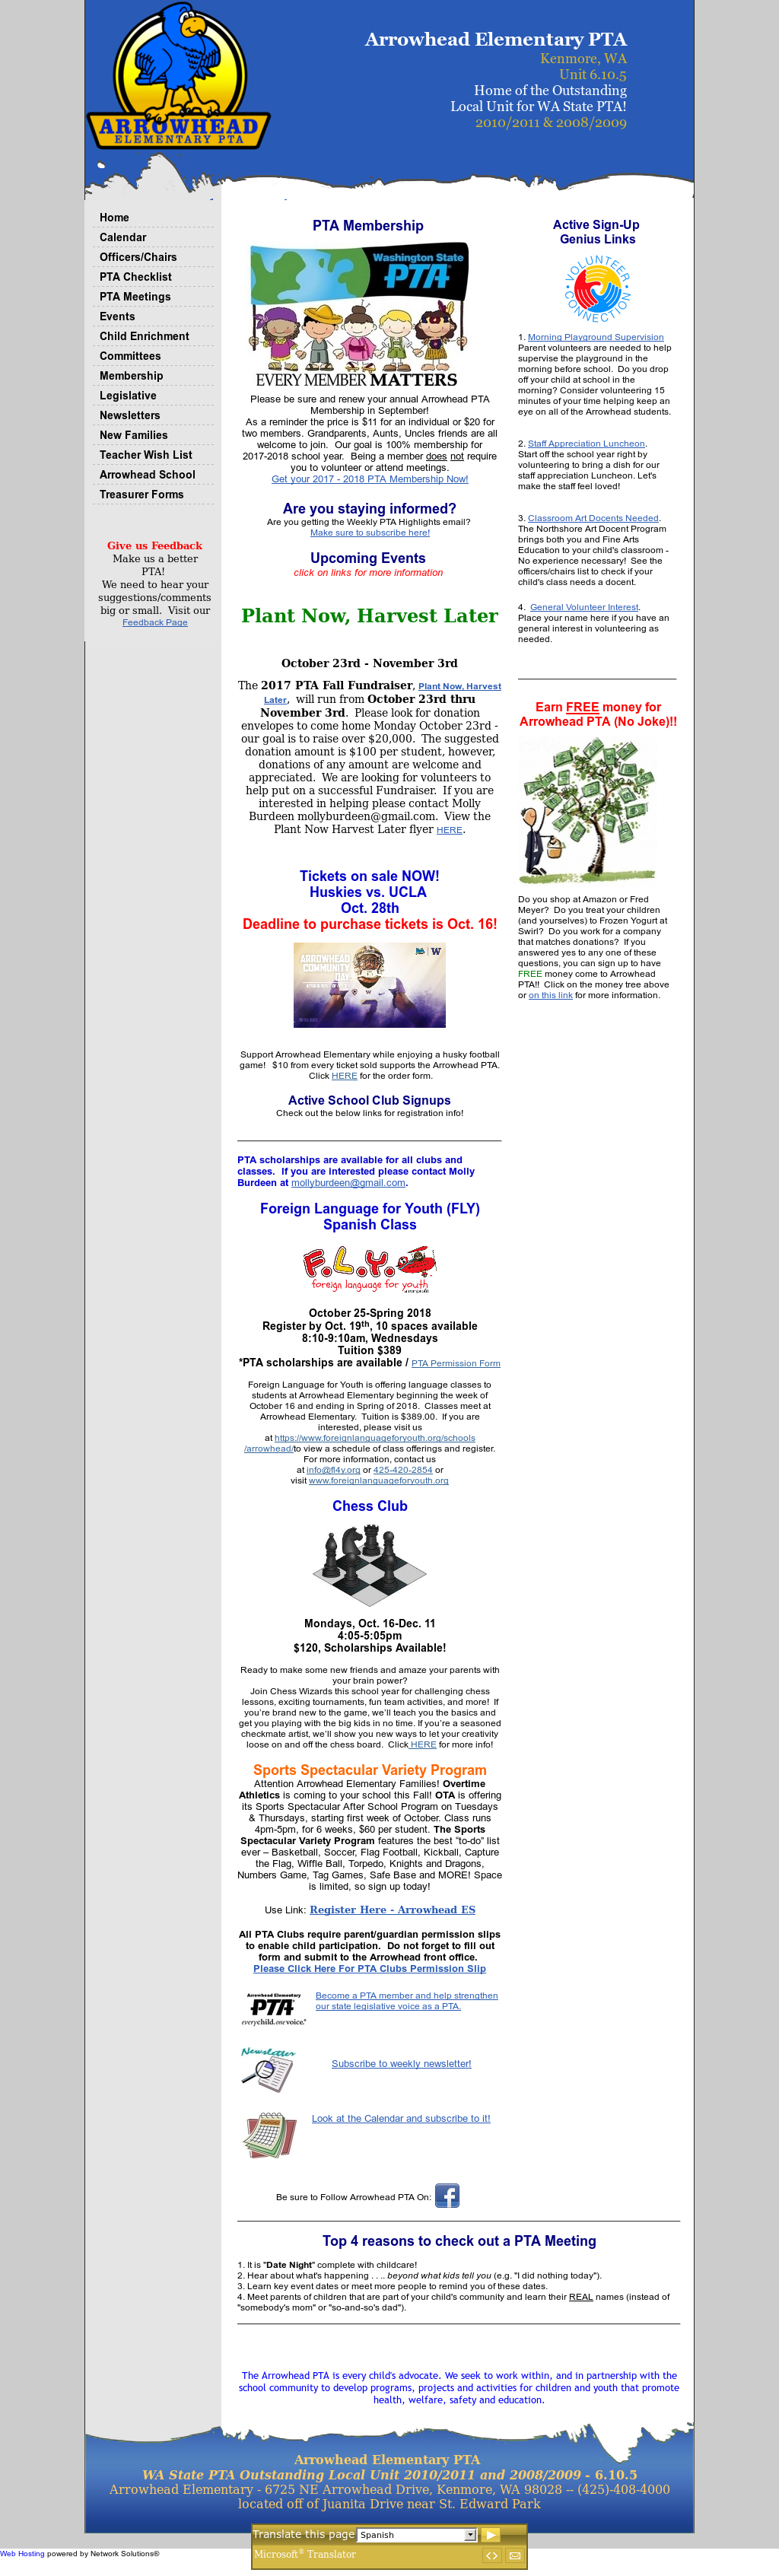 Arrowhead Elementary Pta (Kenmore) Competitors, Revenue and